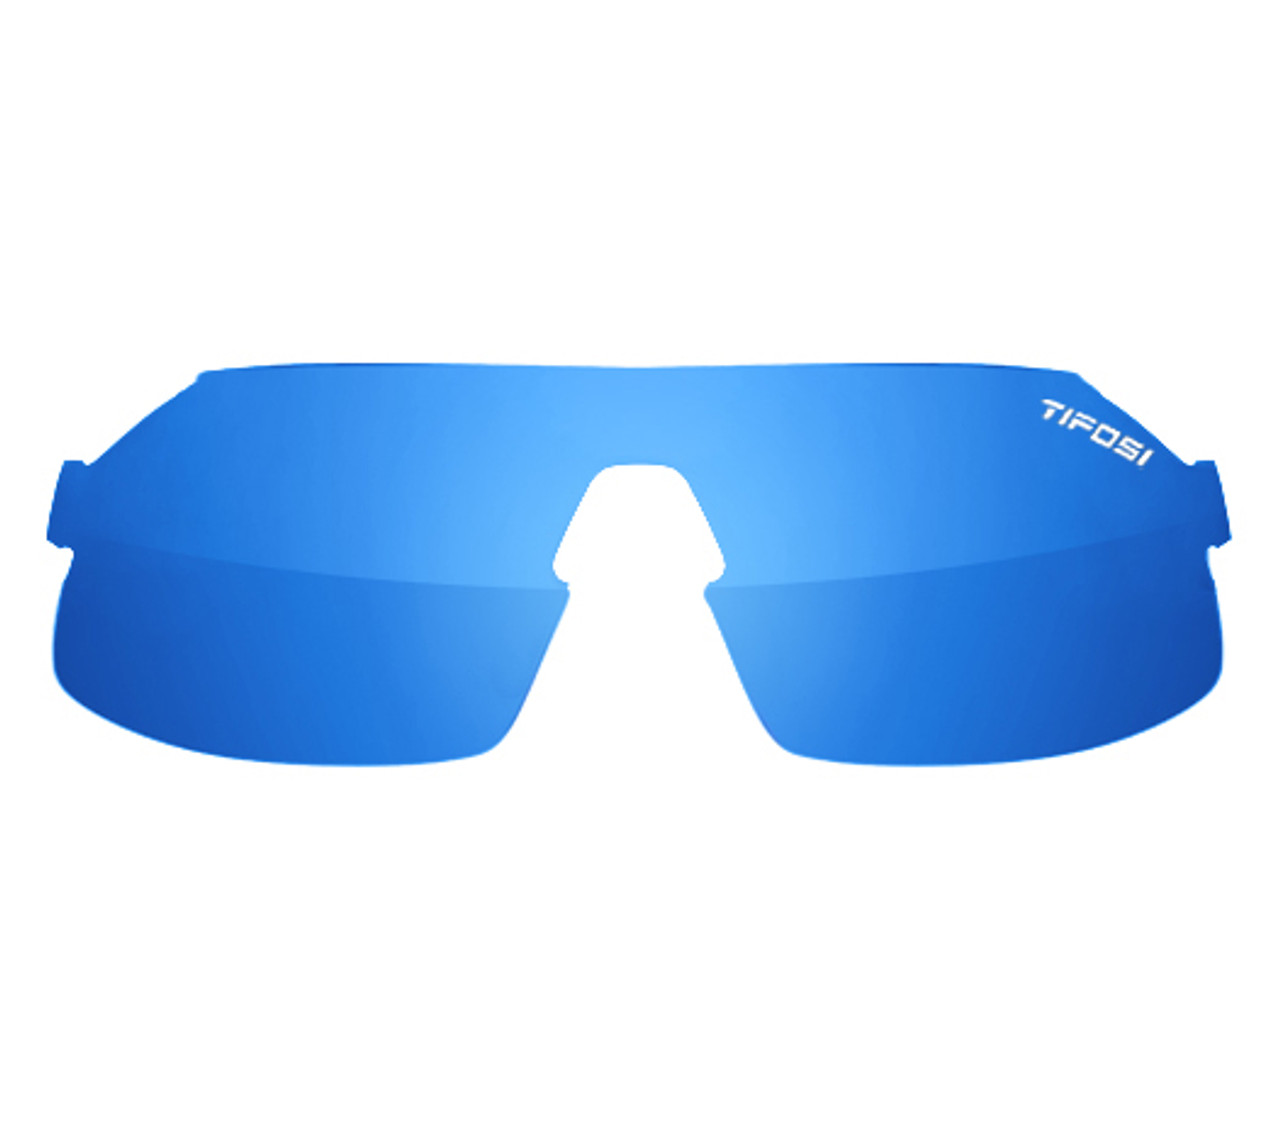 Clarion Blue